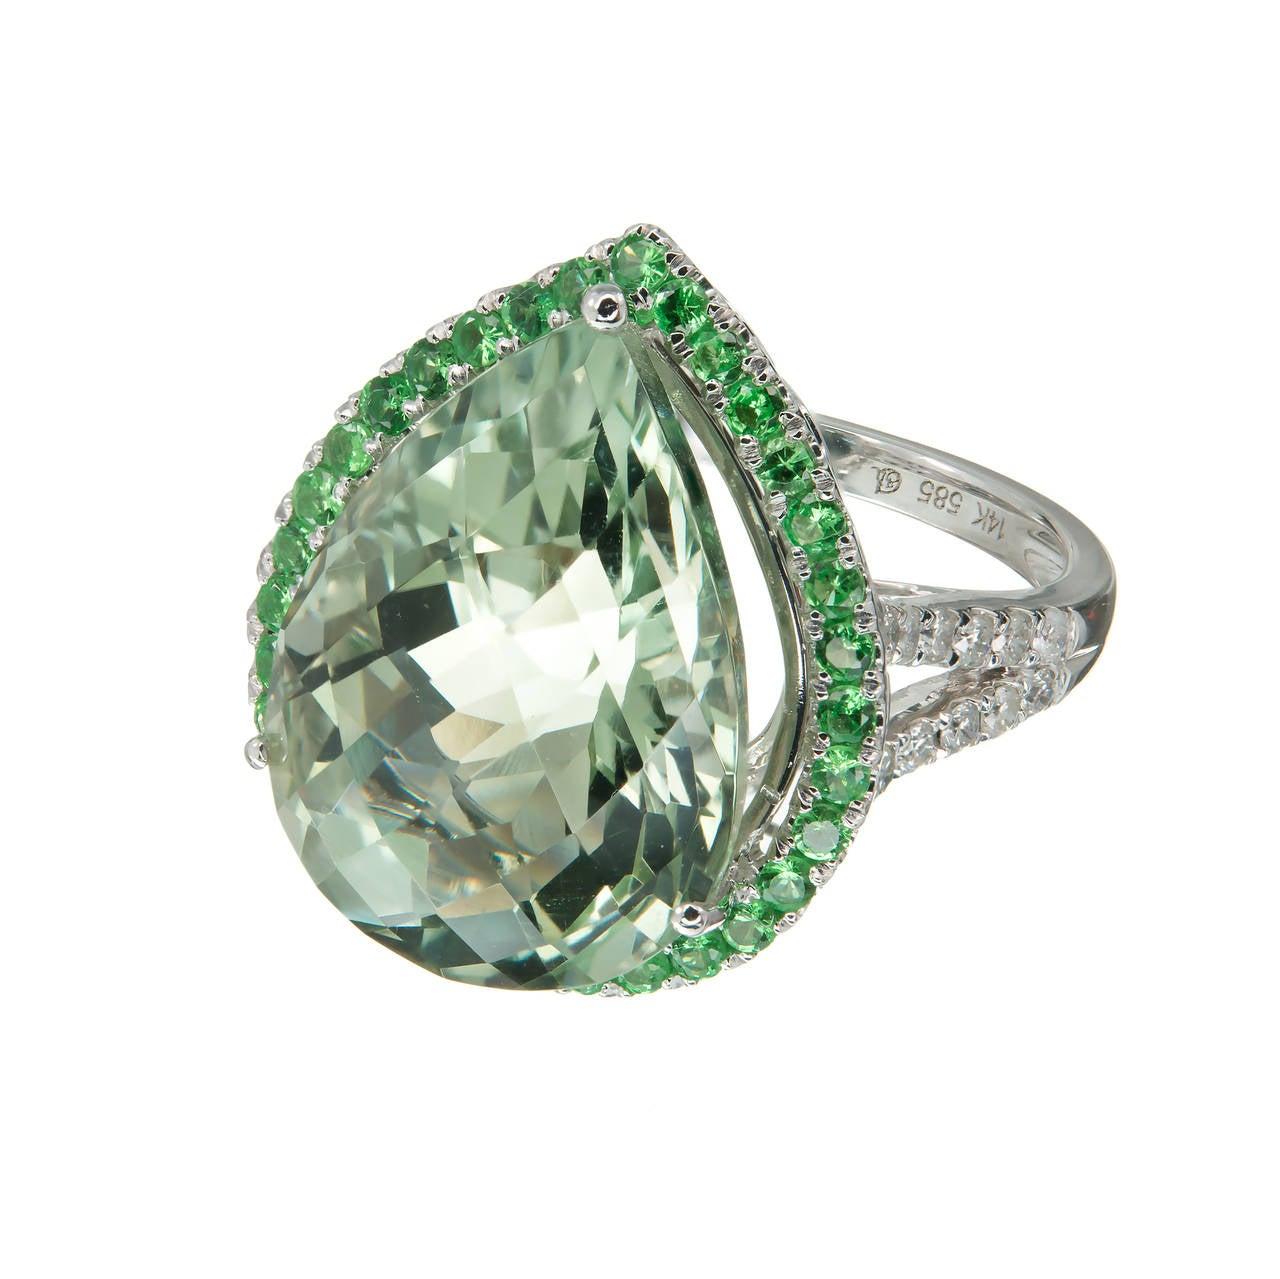 Green Quartz Prasiolite Garnet Diamond Gold Cocktail Ring In Good Condition For Sale In Stamford, CT